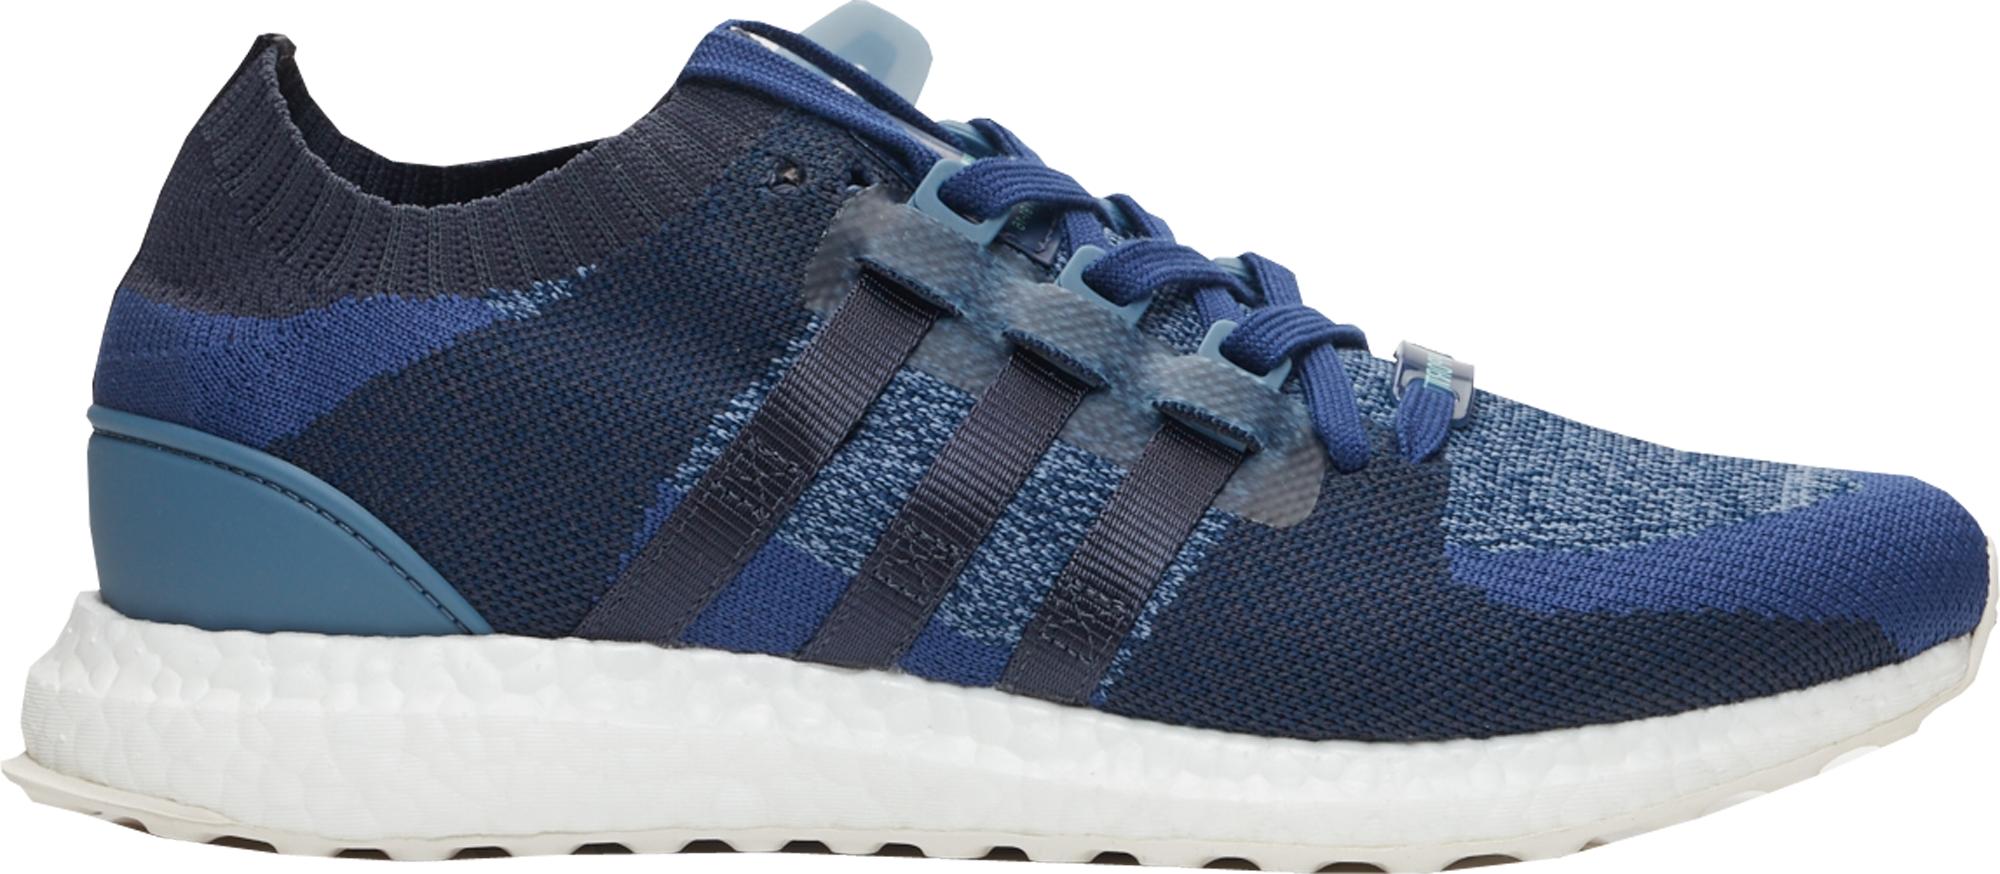 official photos 1d877 25312 ... spain adidas eqt support ultra primeknit materials blue 30ee9 76d62